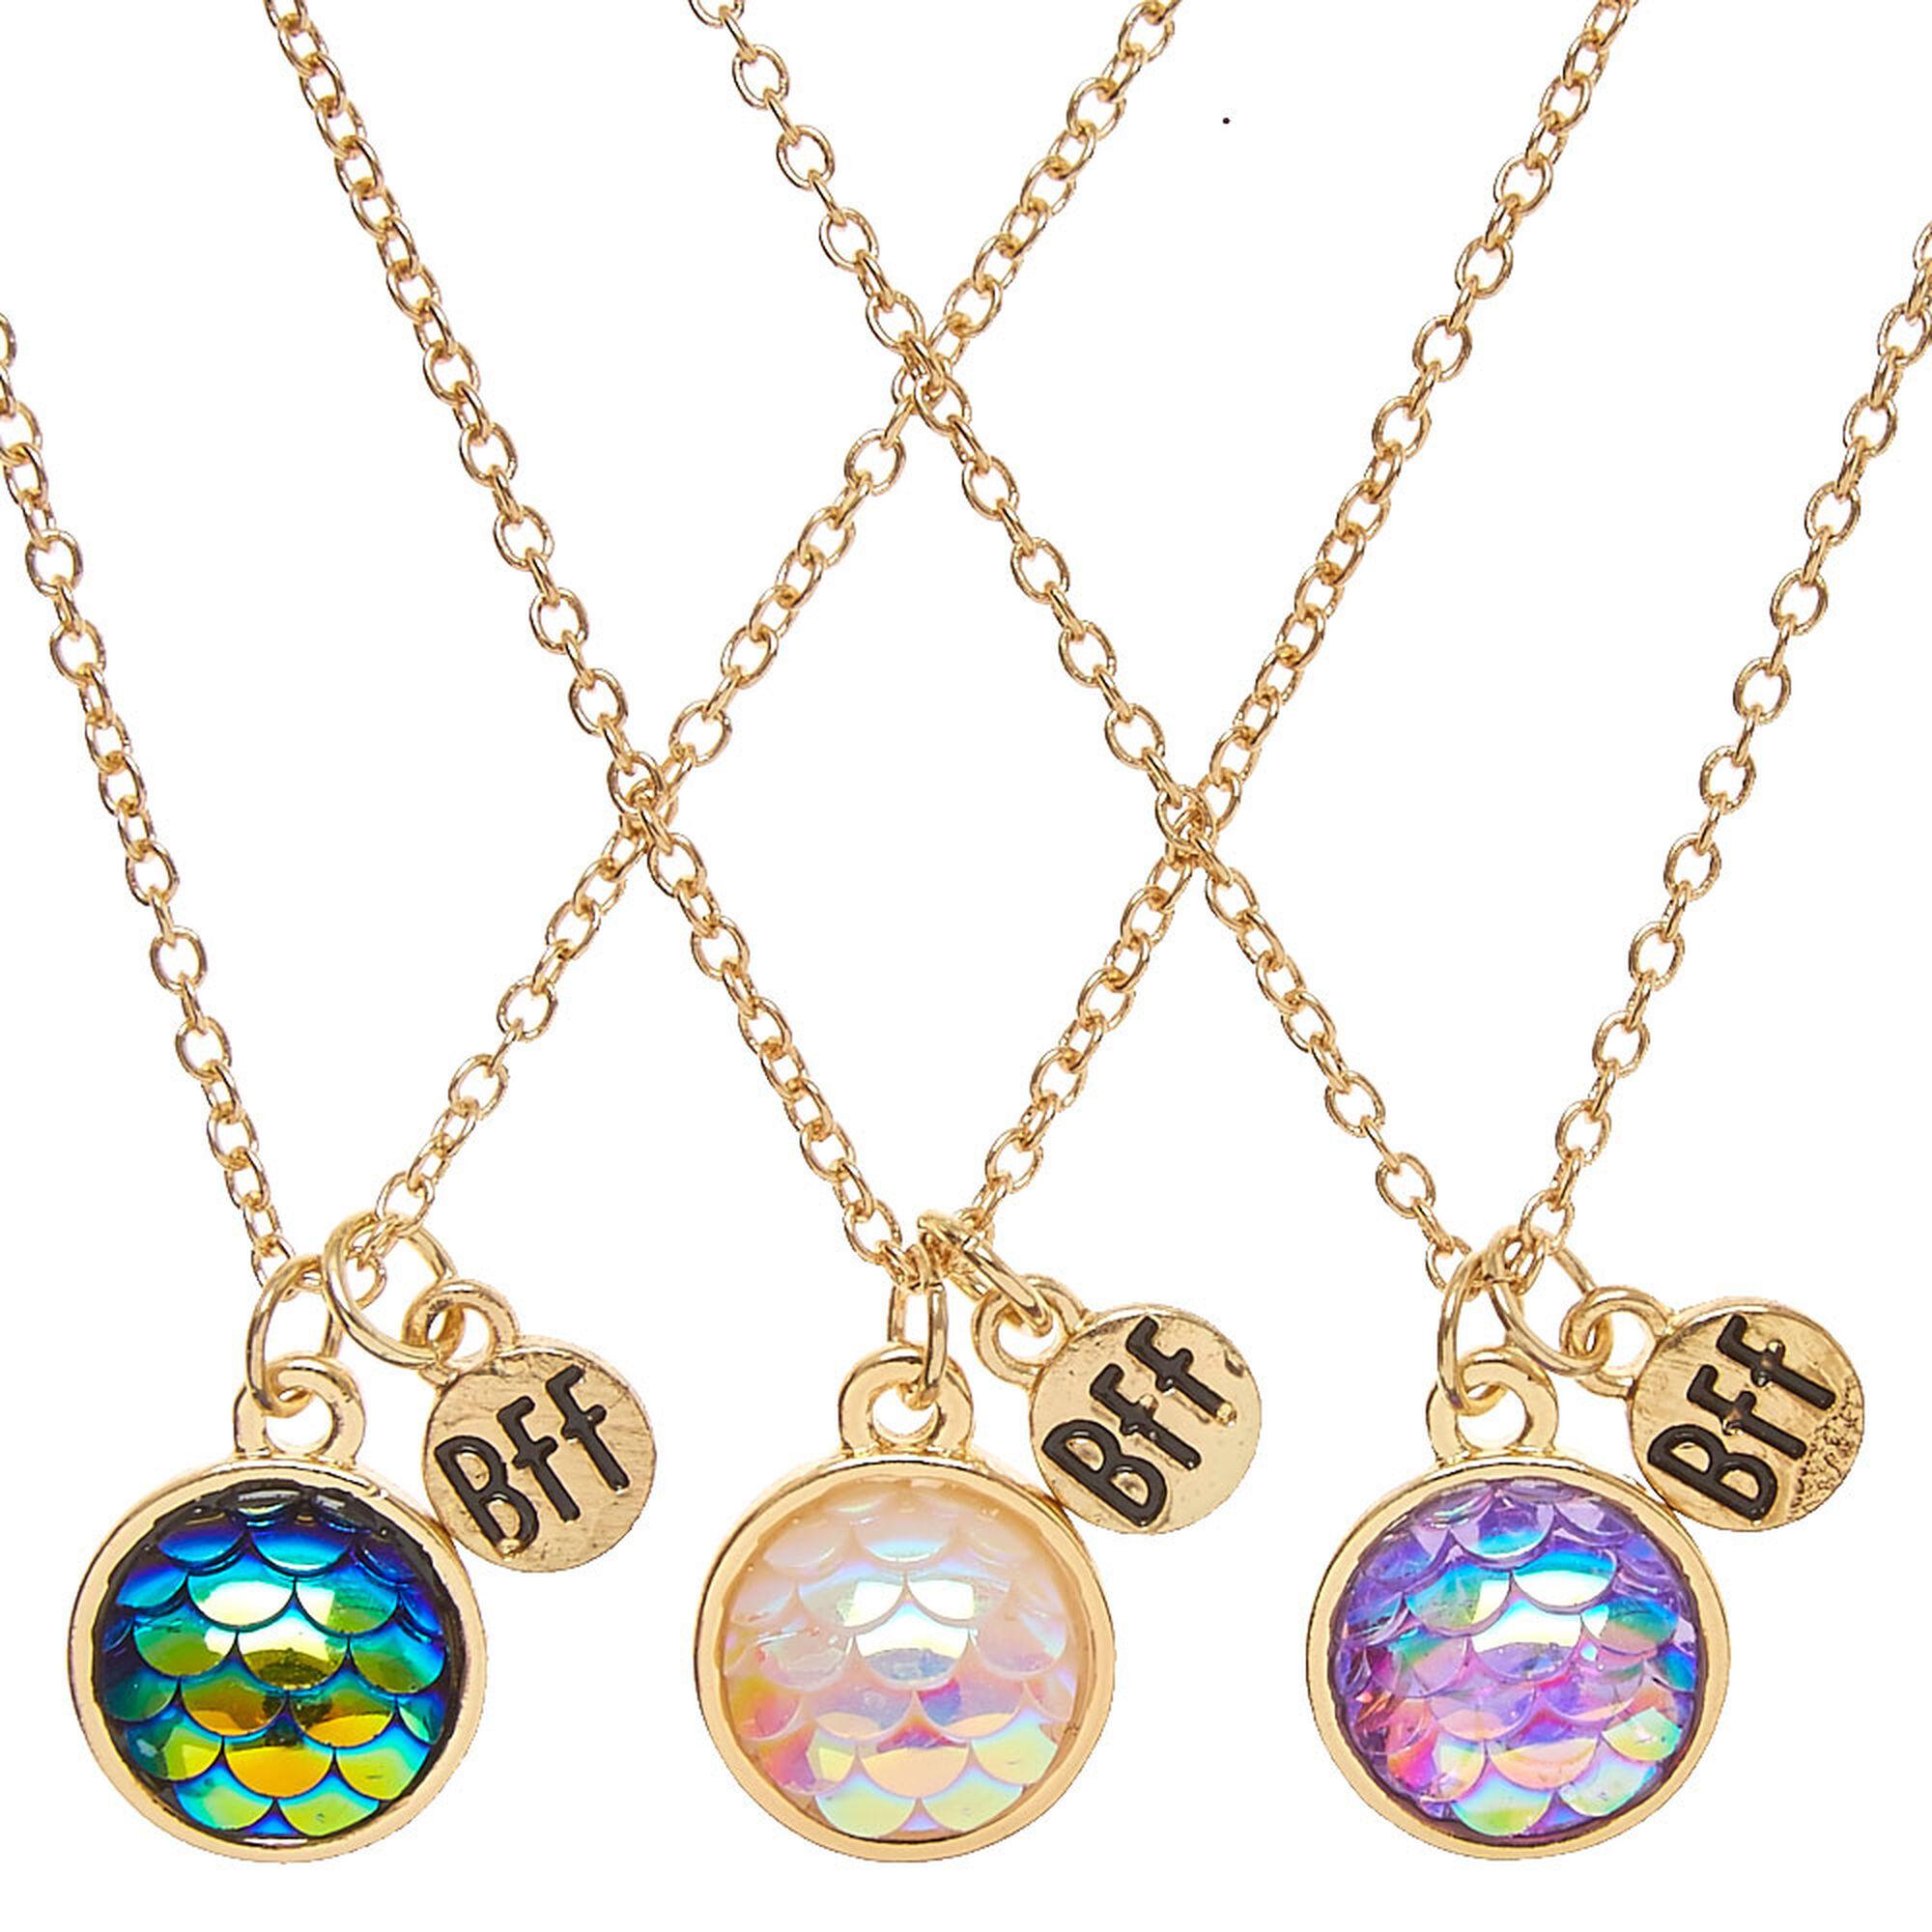 Bff Necklaces Marvelous 4 Best Friends Necklaces Bff